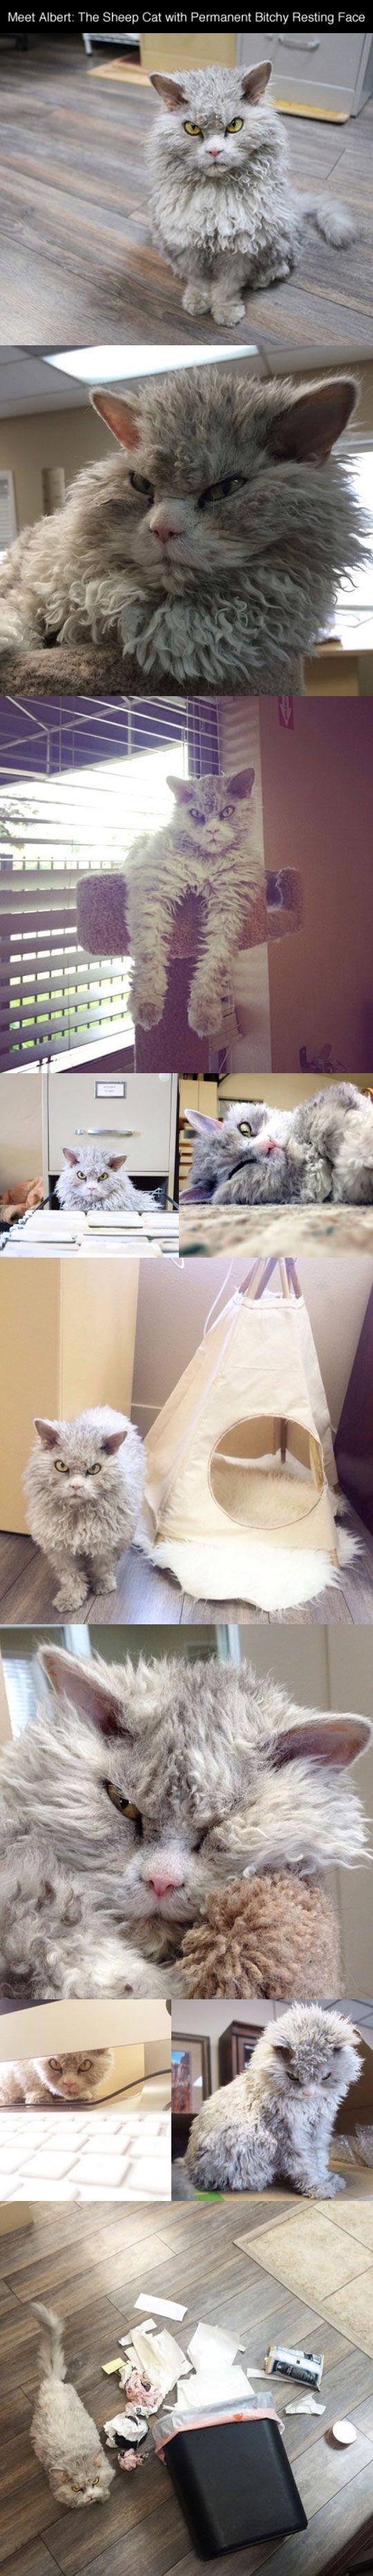 I need a cat like that  ❤